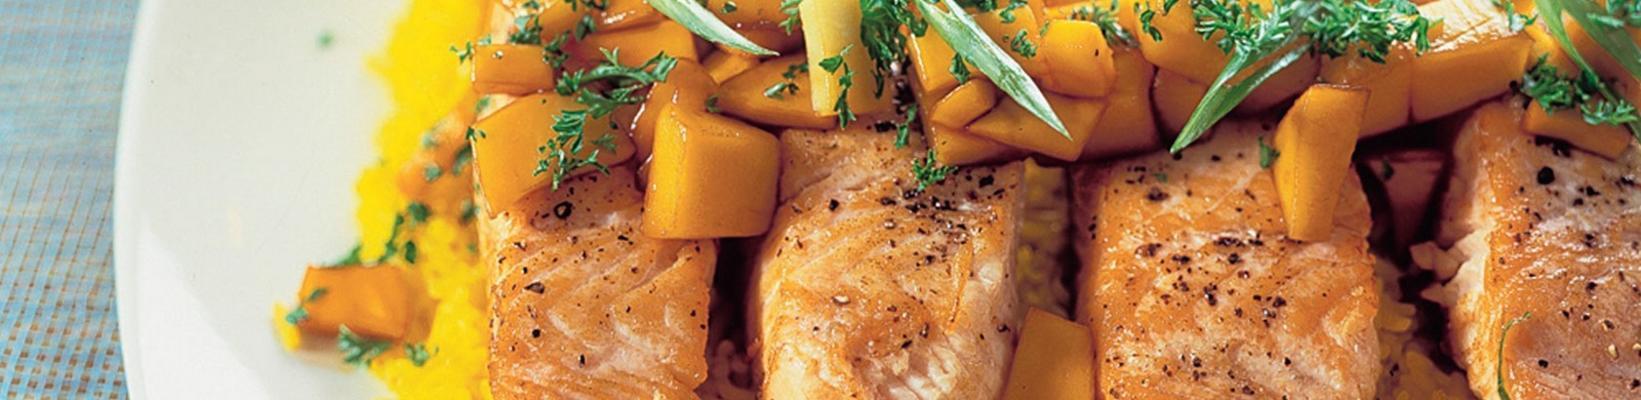 Asian salmon fillet with mango